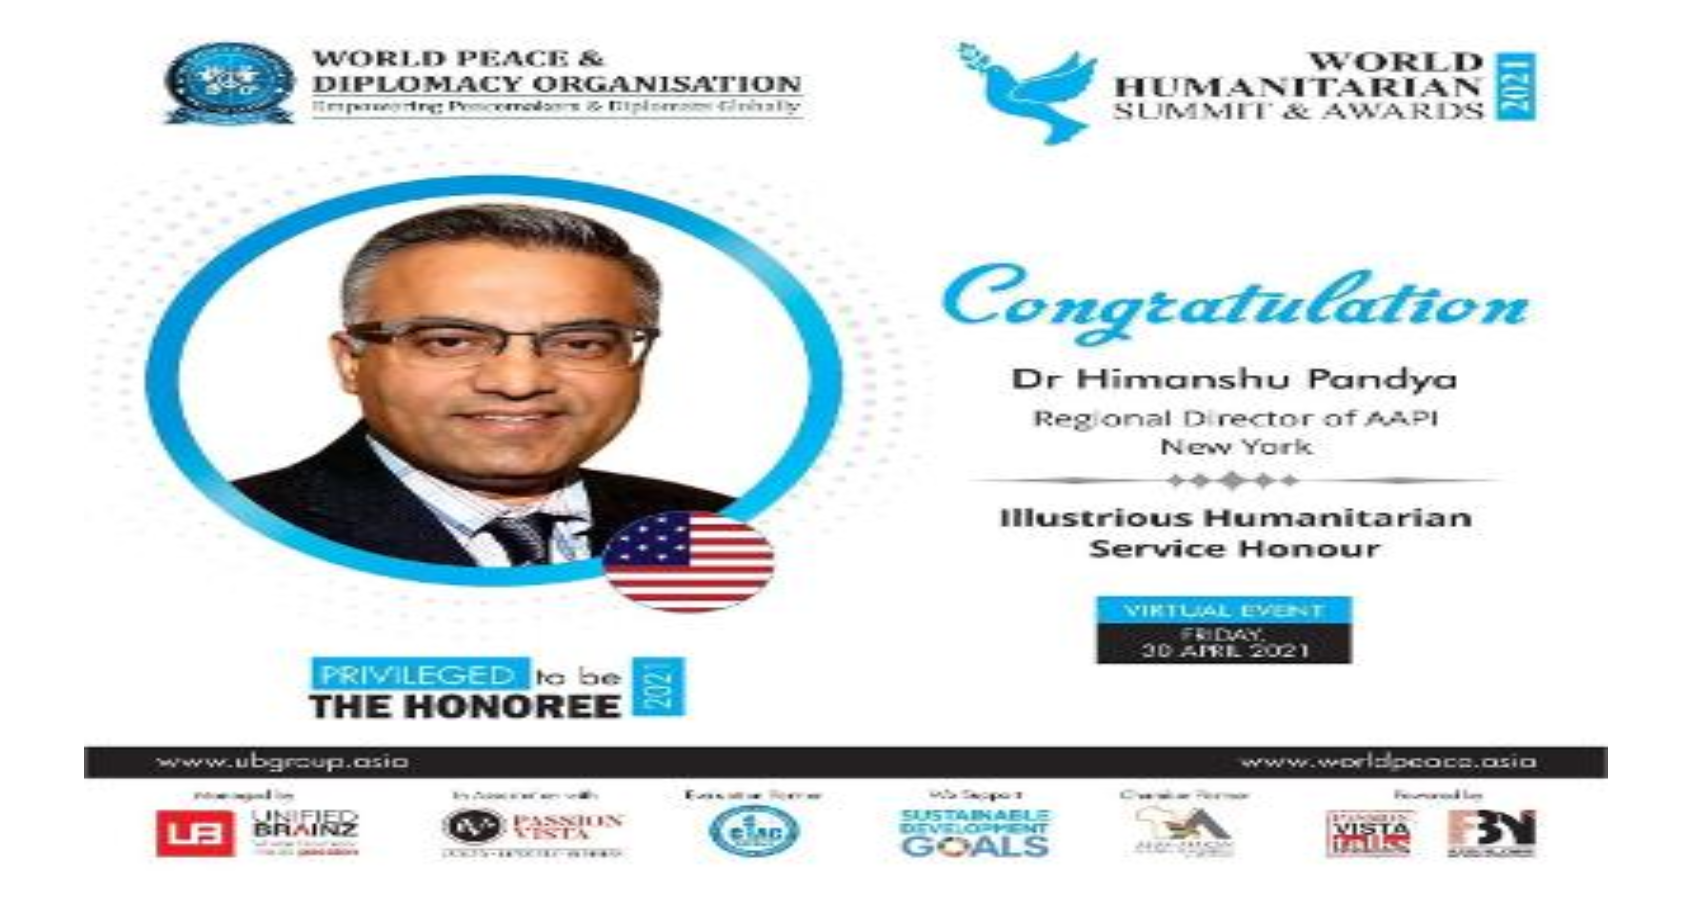 Dr. Himanshu Pandya Honored By World Peace & Diplomacy Organization